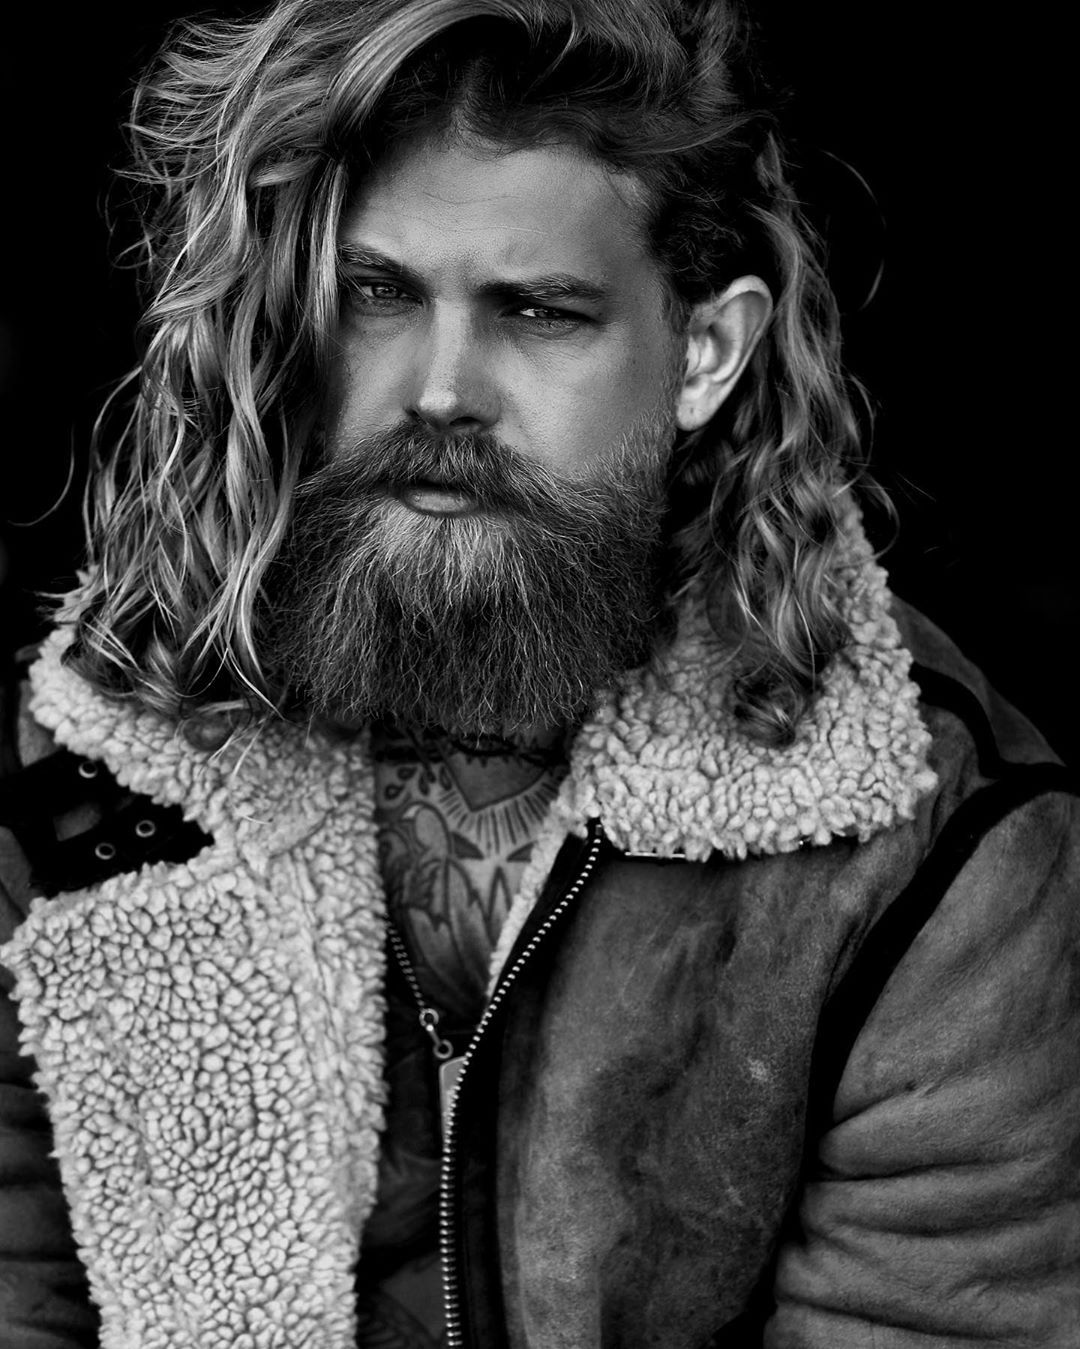 46+ Man bun hairstyle without beard ideas